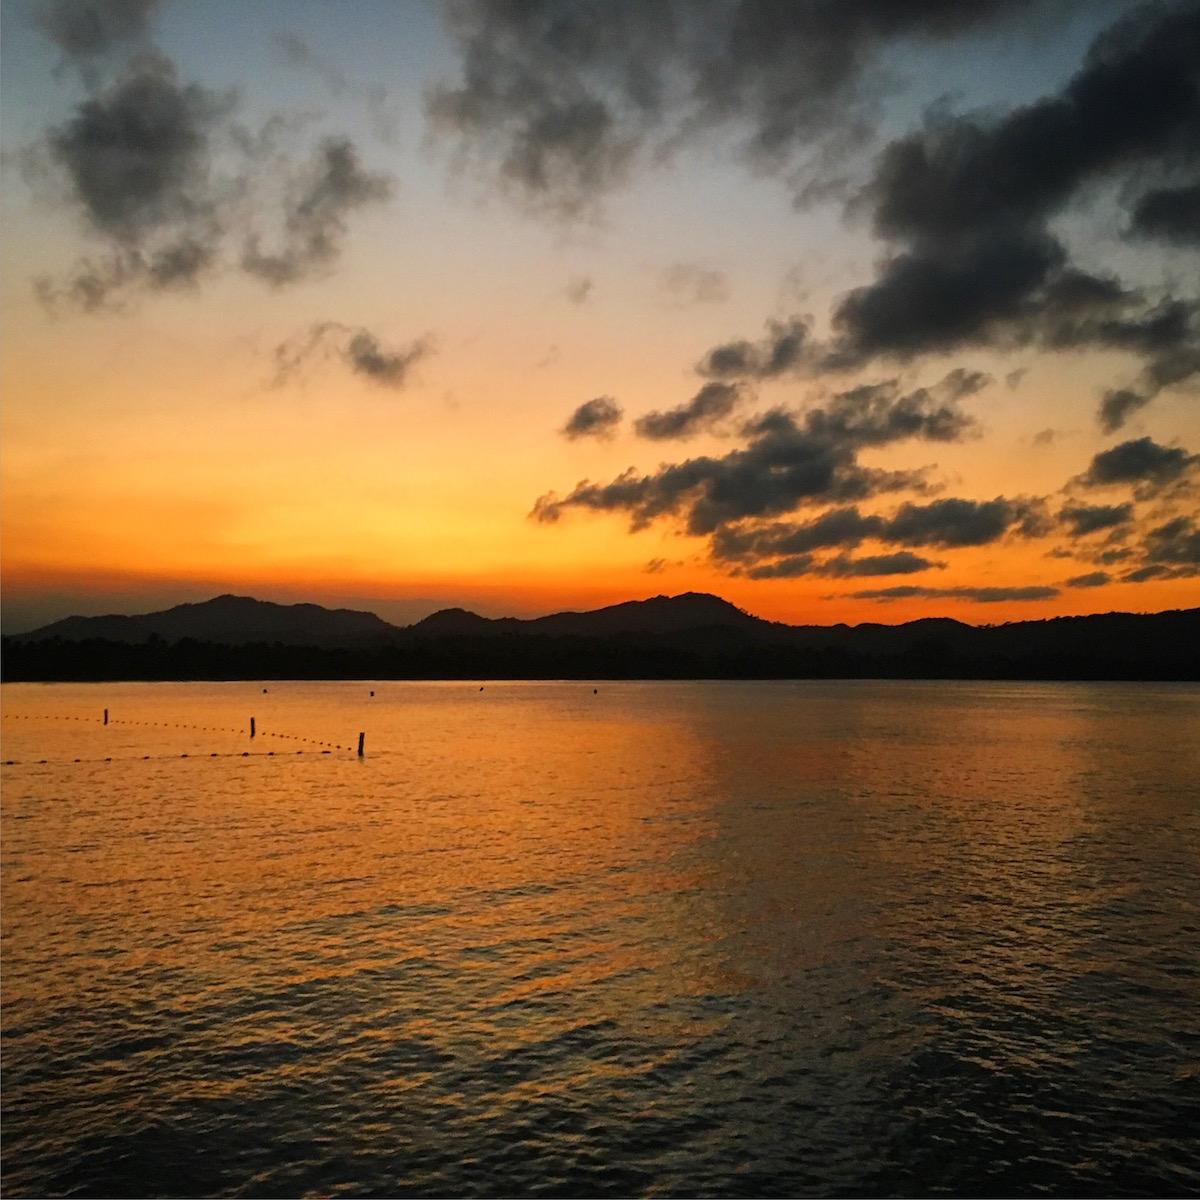 Dominican Republic - Amber Cove sunset